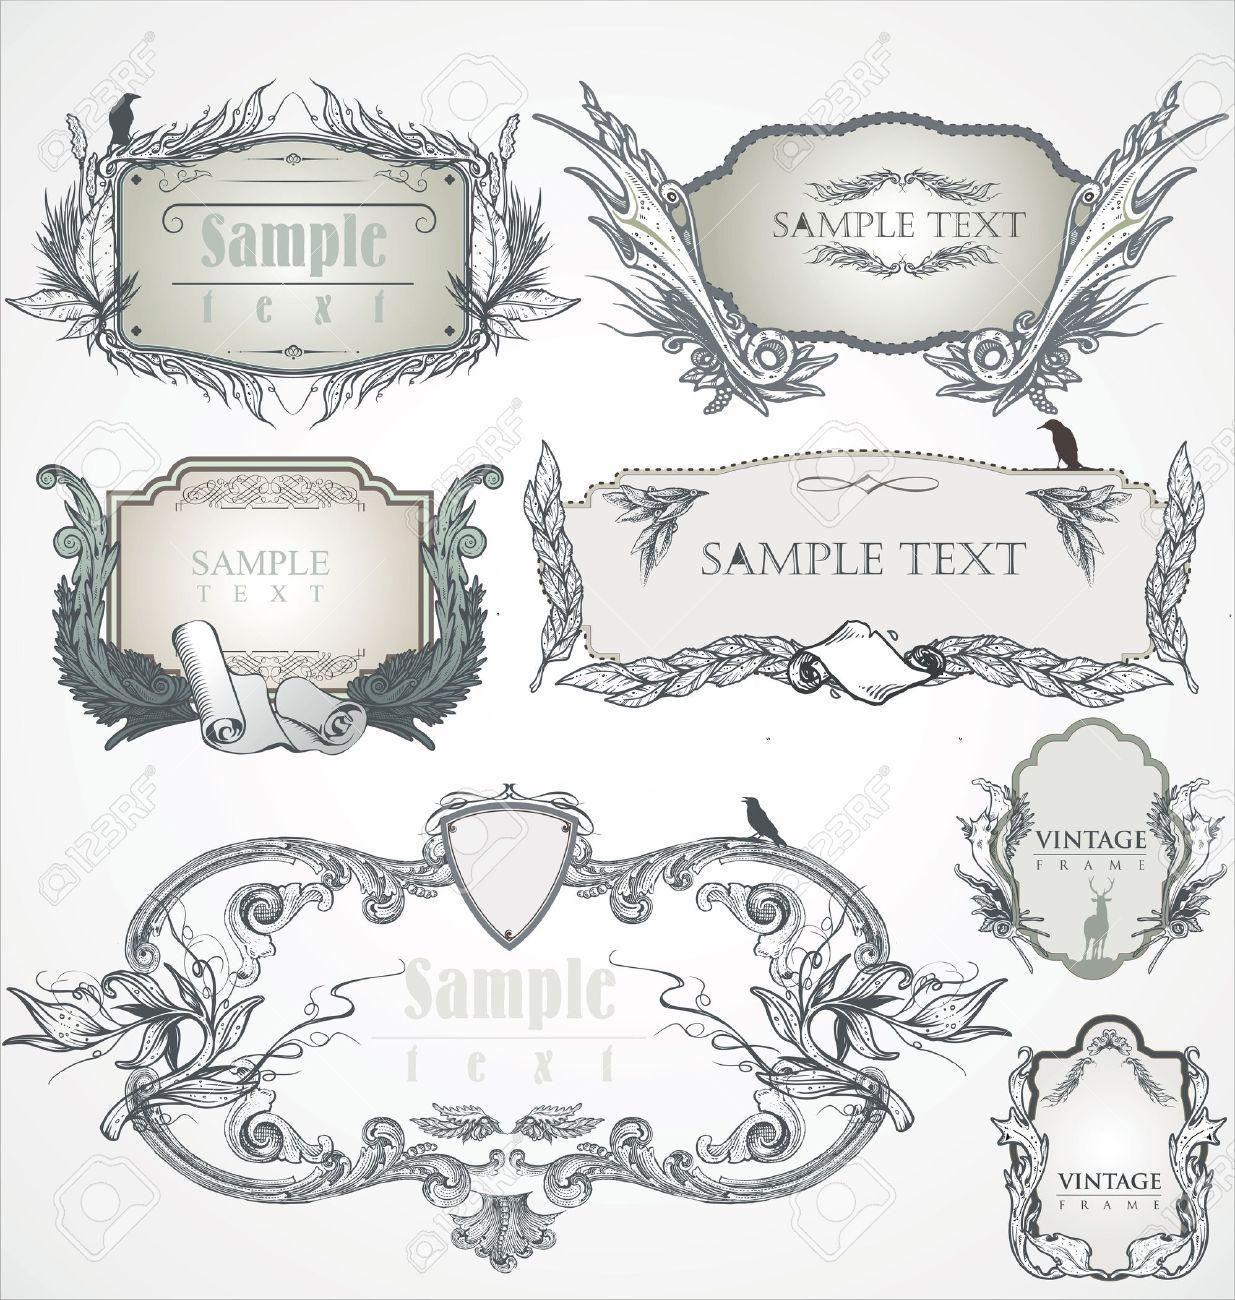 Vintage frame. Flourish heraldry elements. Stock Vector - 12004595